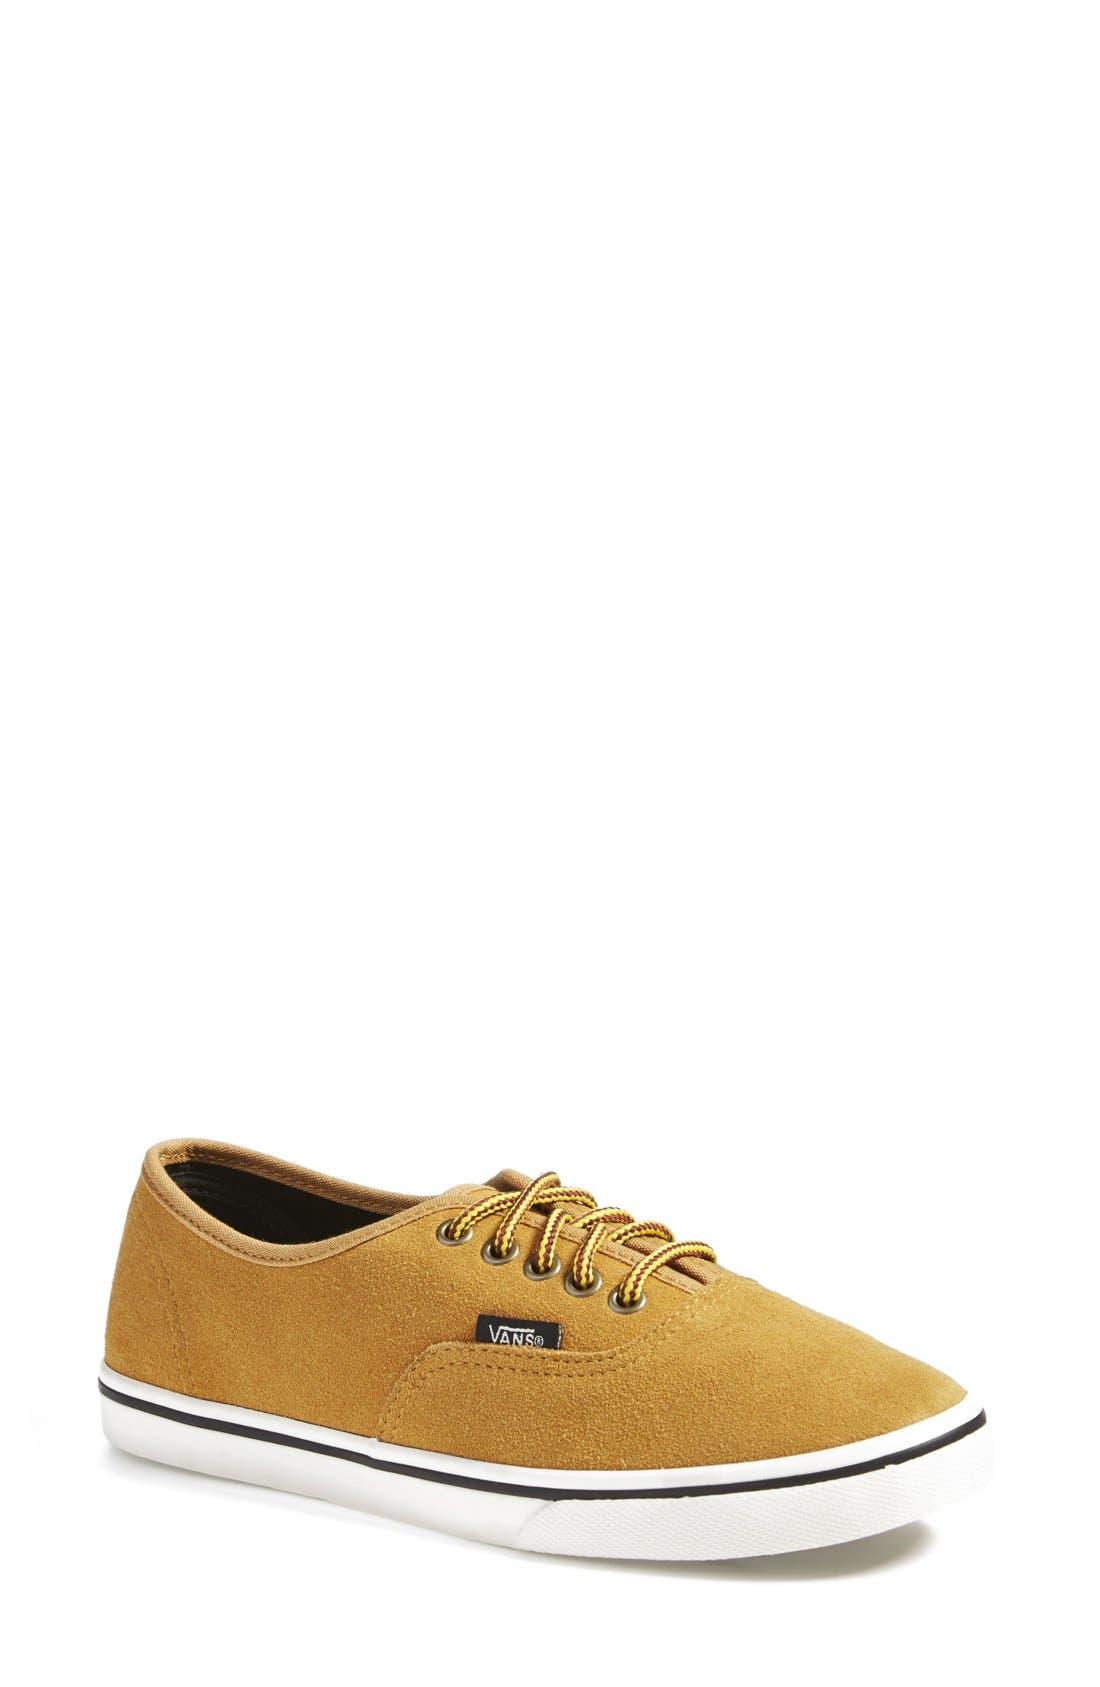 Main Image - Vans 'Authentic - Lo Pro' Suede Sneaker (Women)